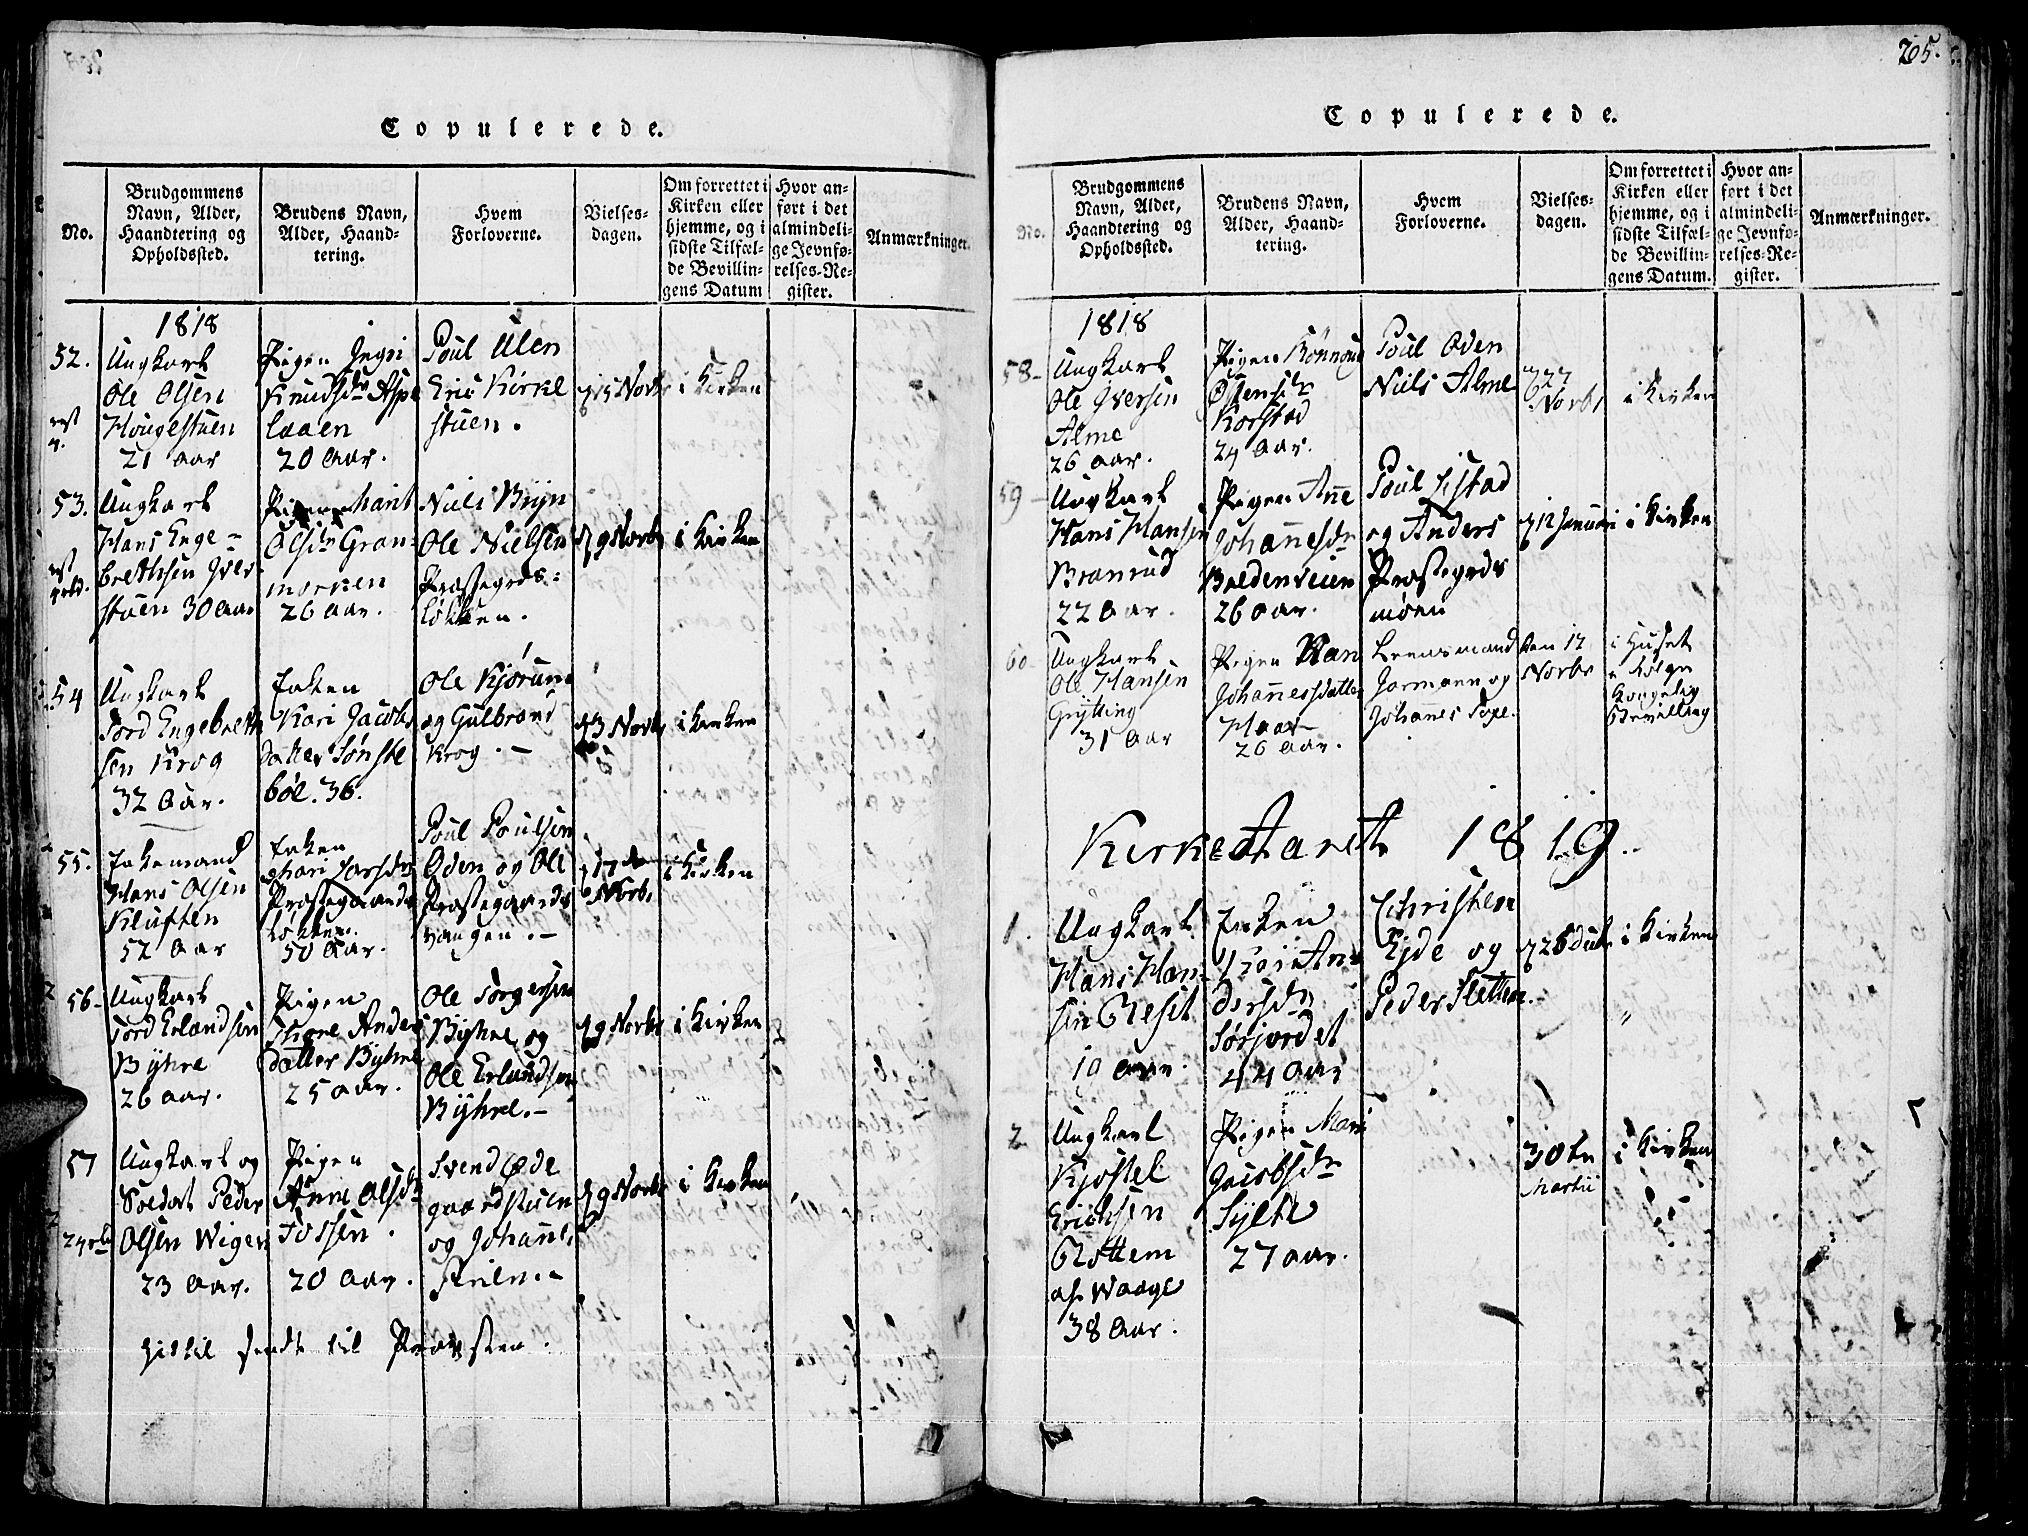 SAH, Fron prestekontor, H/Ha/Haa/L0002: Ministerialbok nr. 2, 1816-1827, s. 205